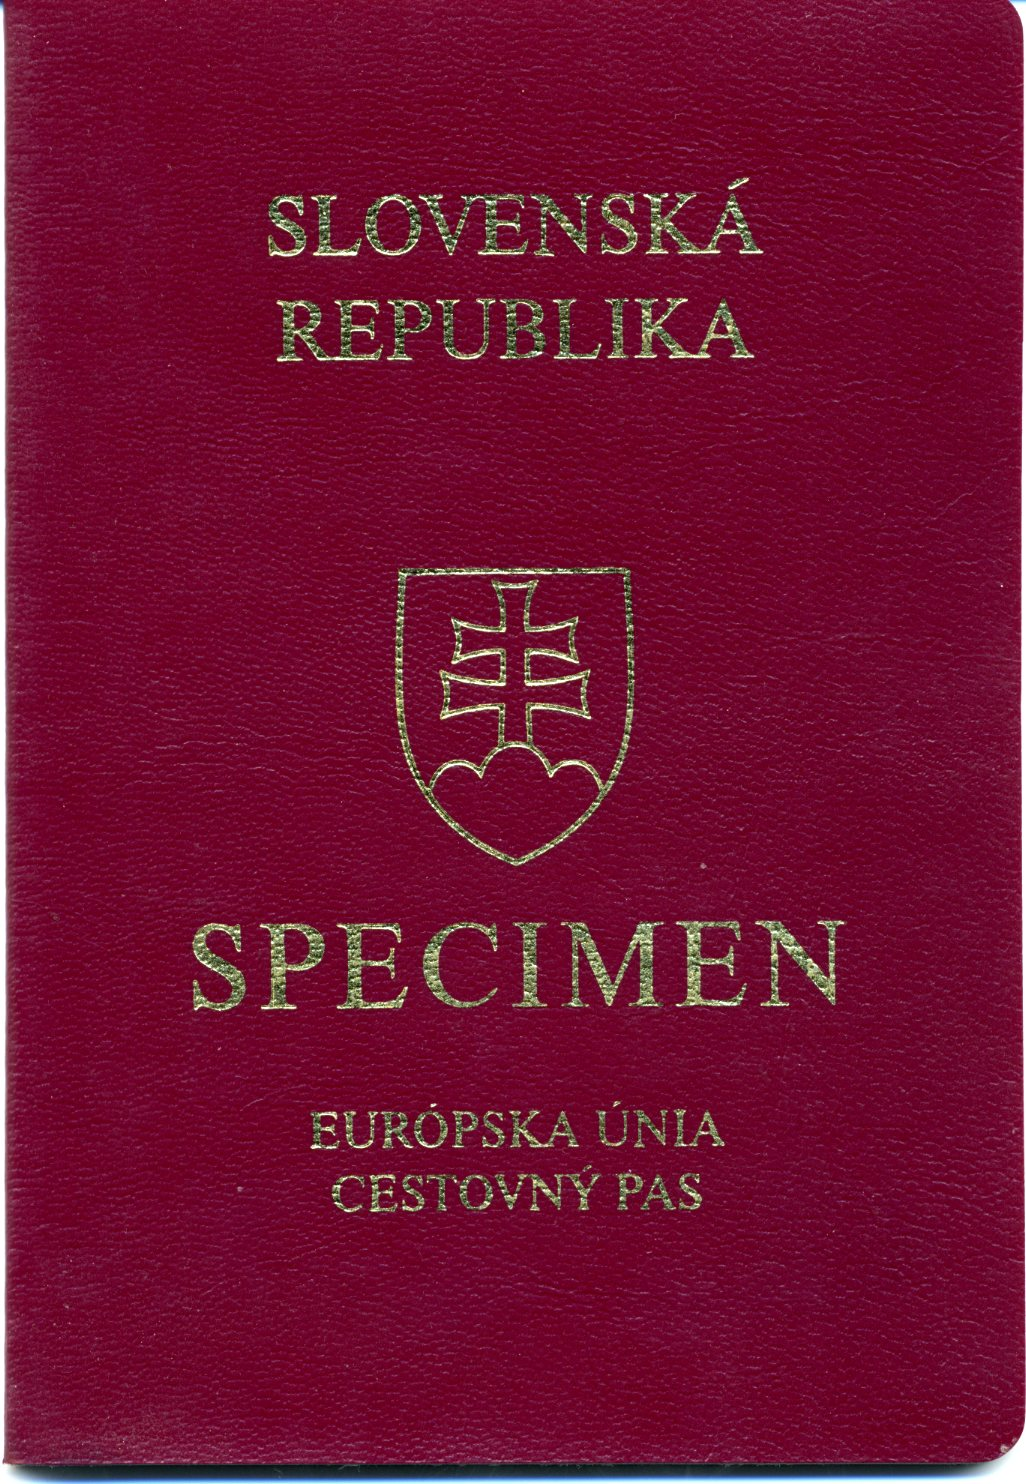 Fileslovak passport 2005g wikimedia commons fileslovak passport 2005g ccuart Images